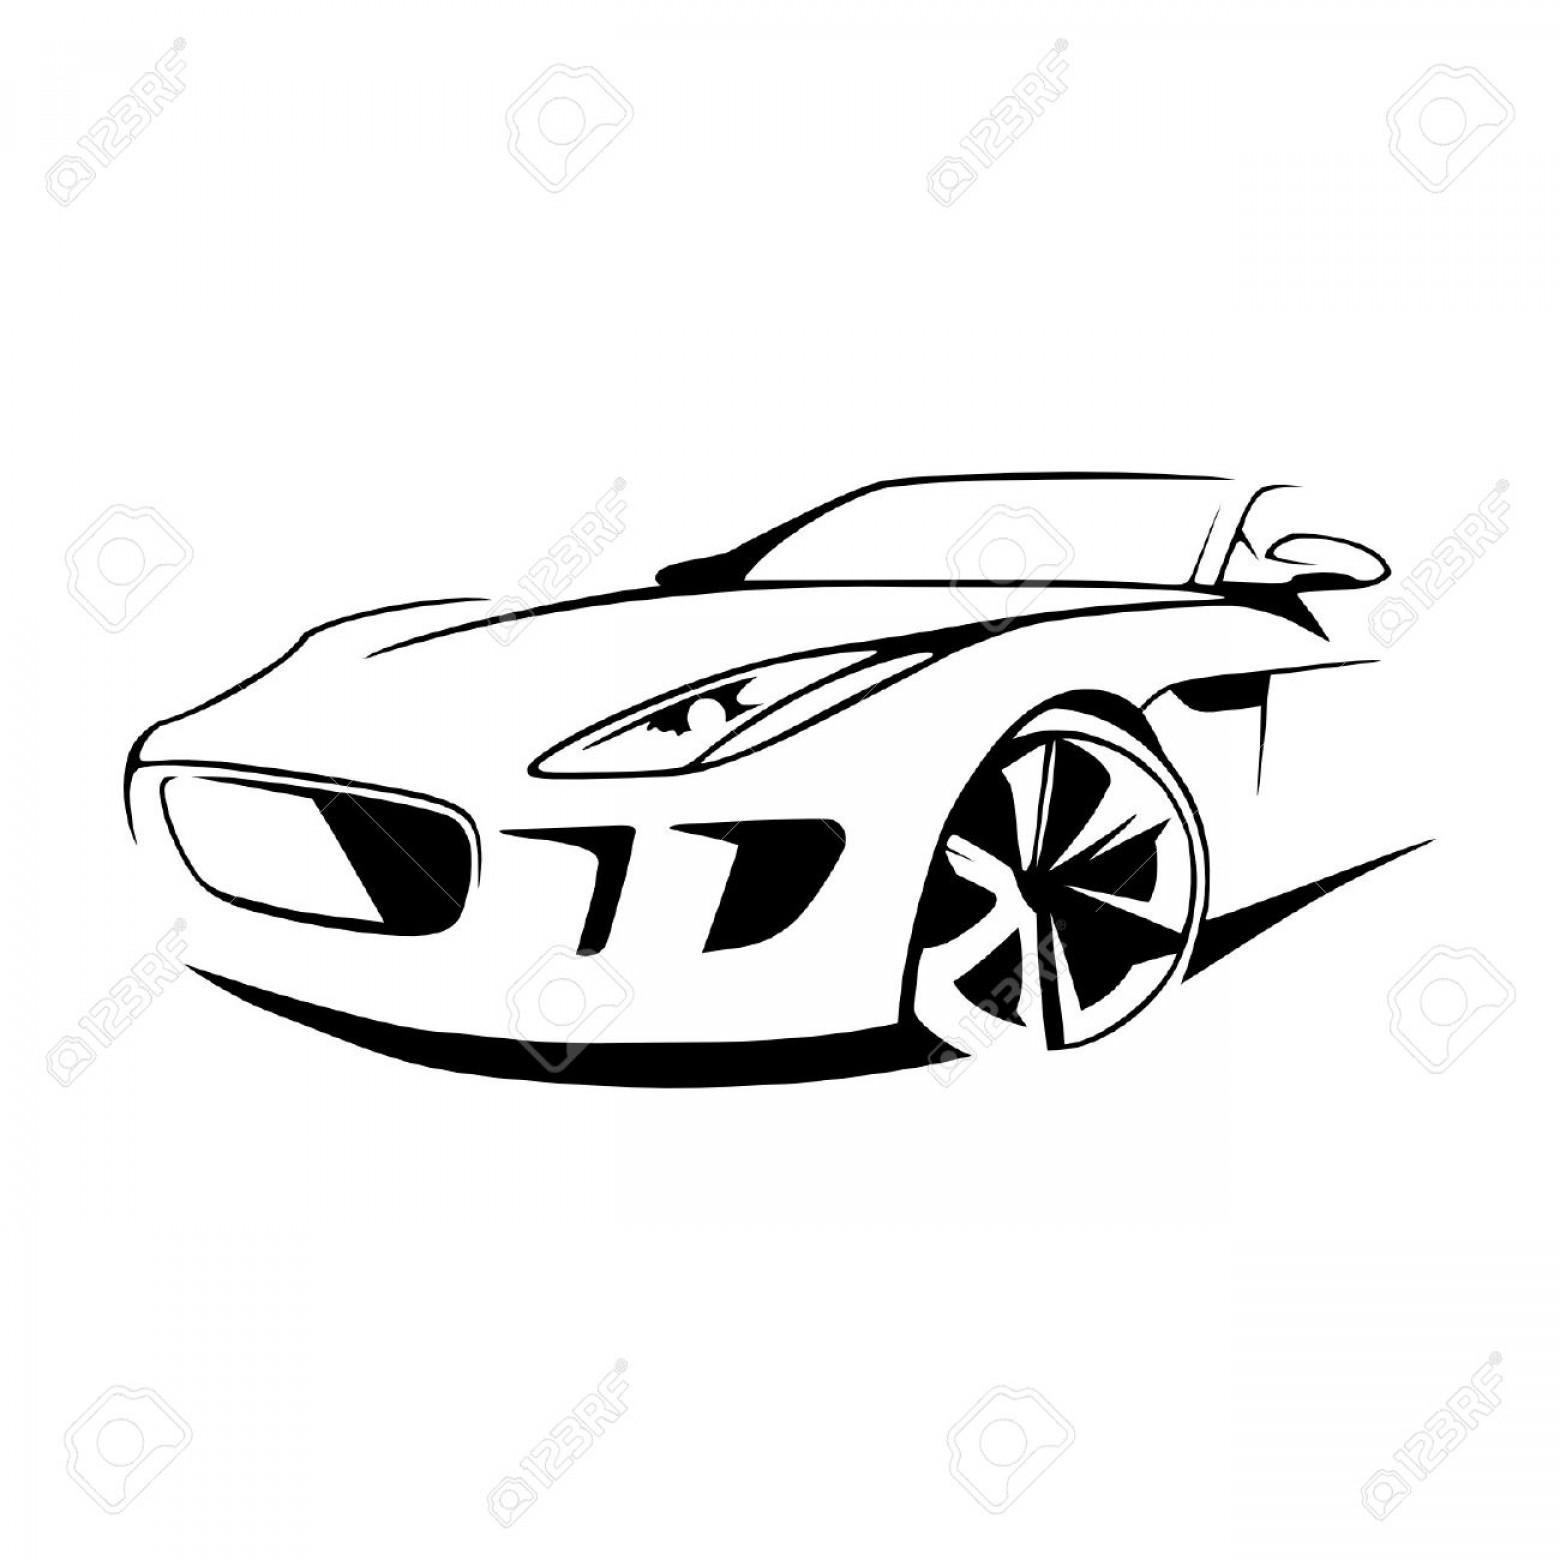 1560x1560 Unique Sports Car Silhouette Vector Library Free Vector Art